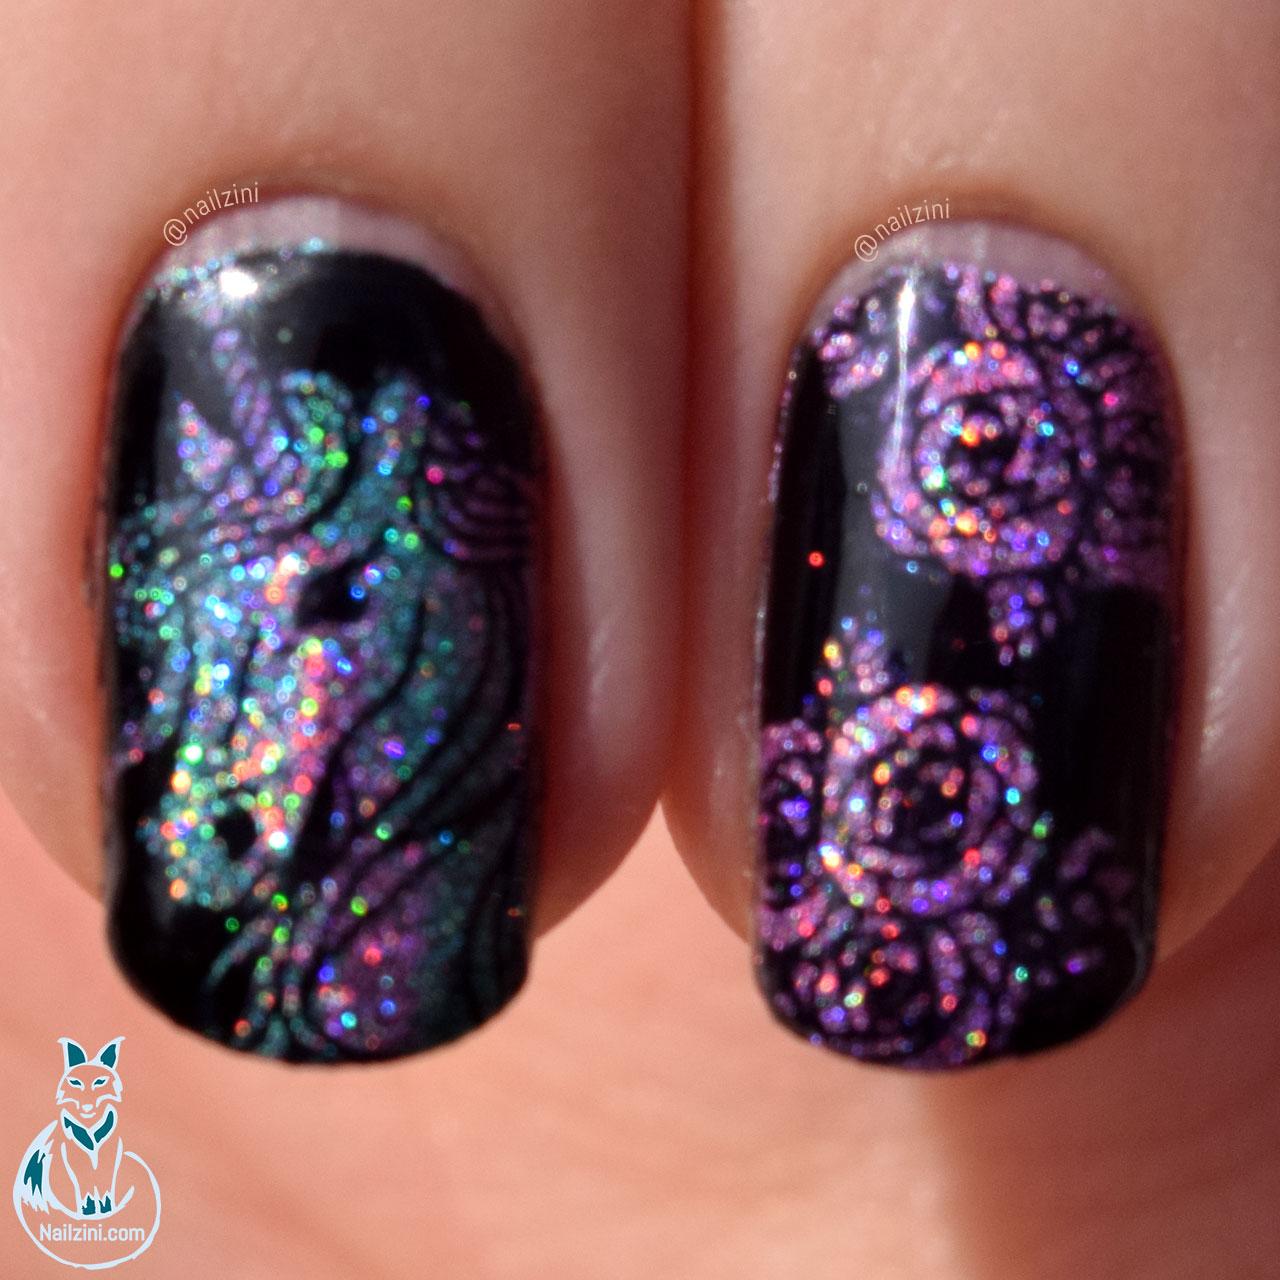 Nailzini A Nail Art Blog: Holographic Unicorn Nail Art